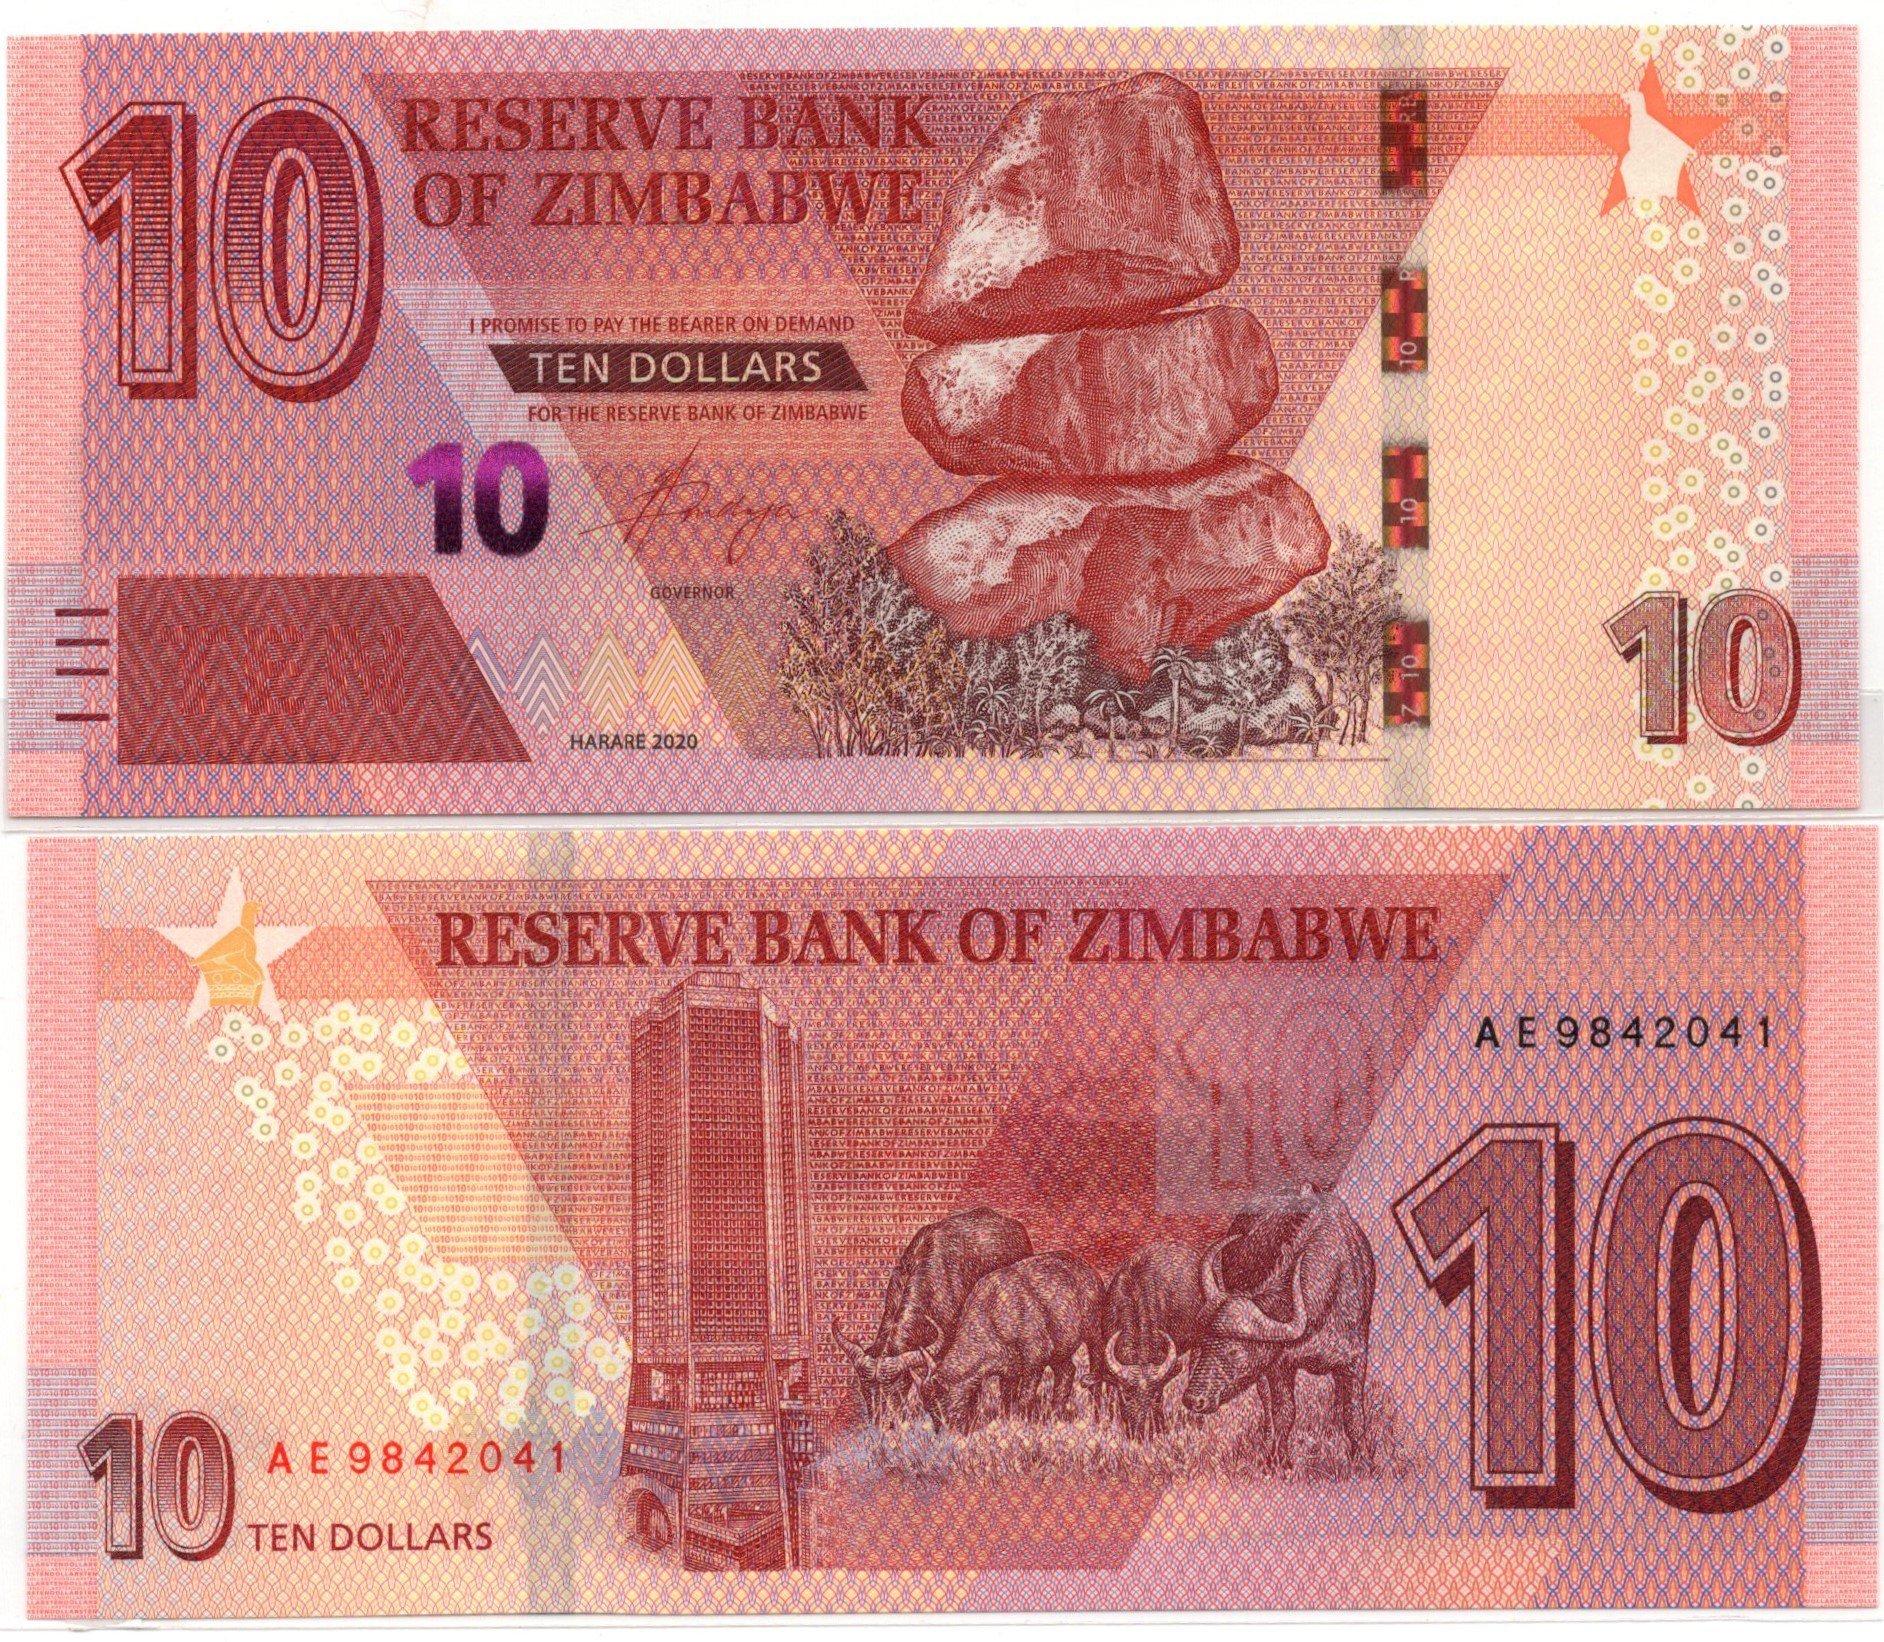 Zimbabwe 10 dollars 2020 banknote